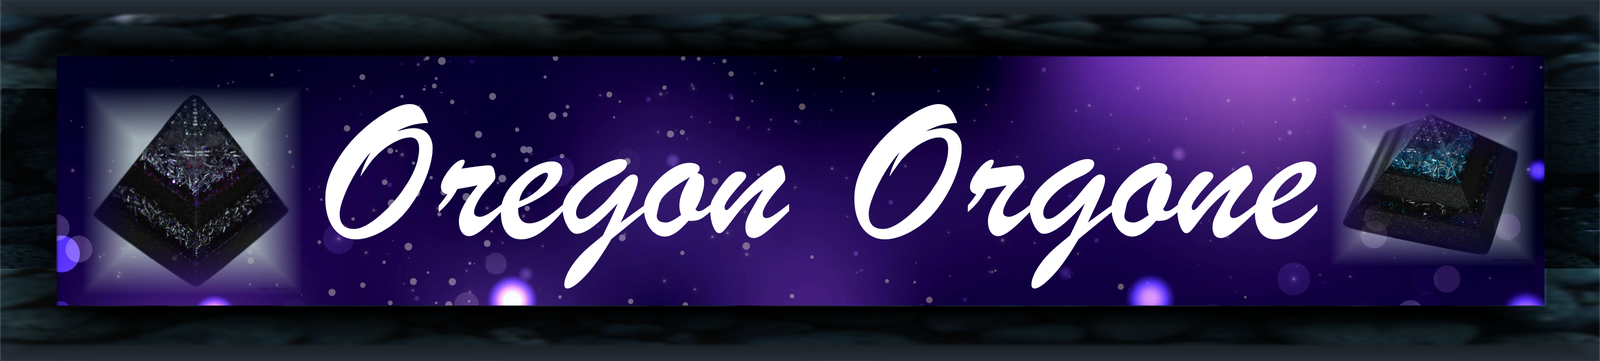 Oregon Orgone